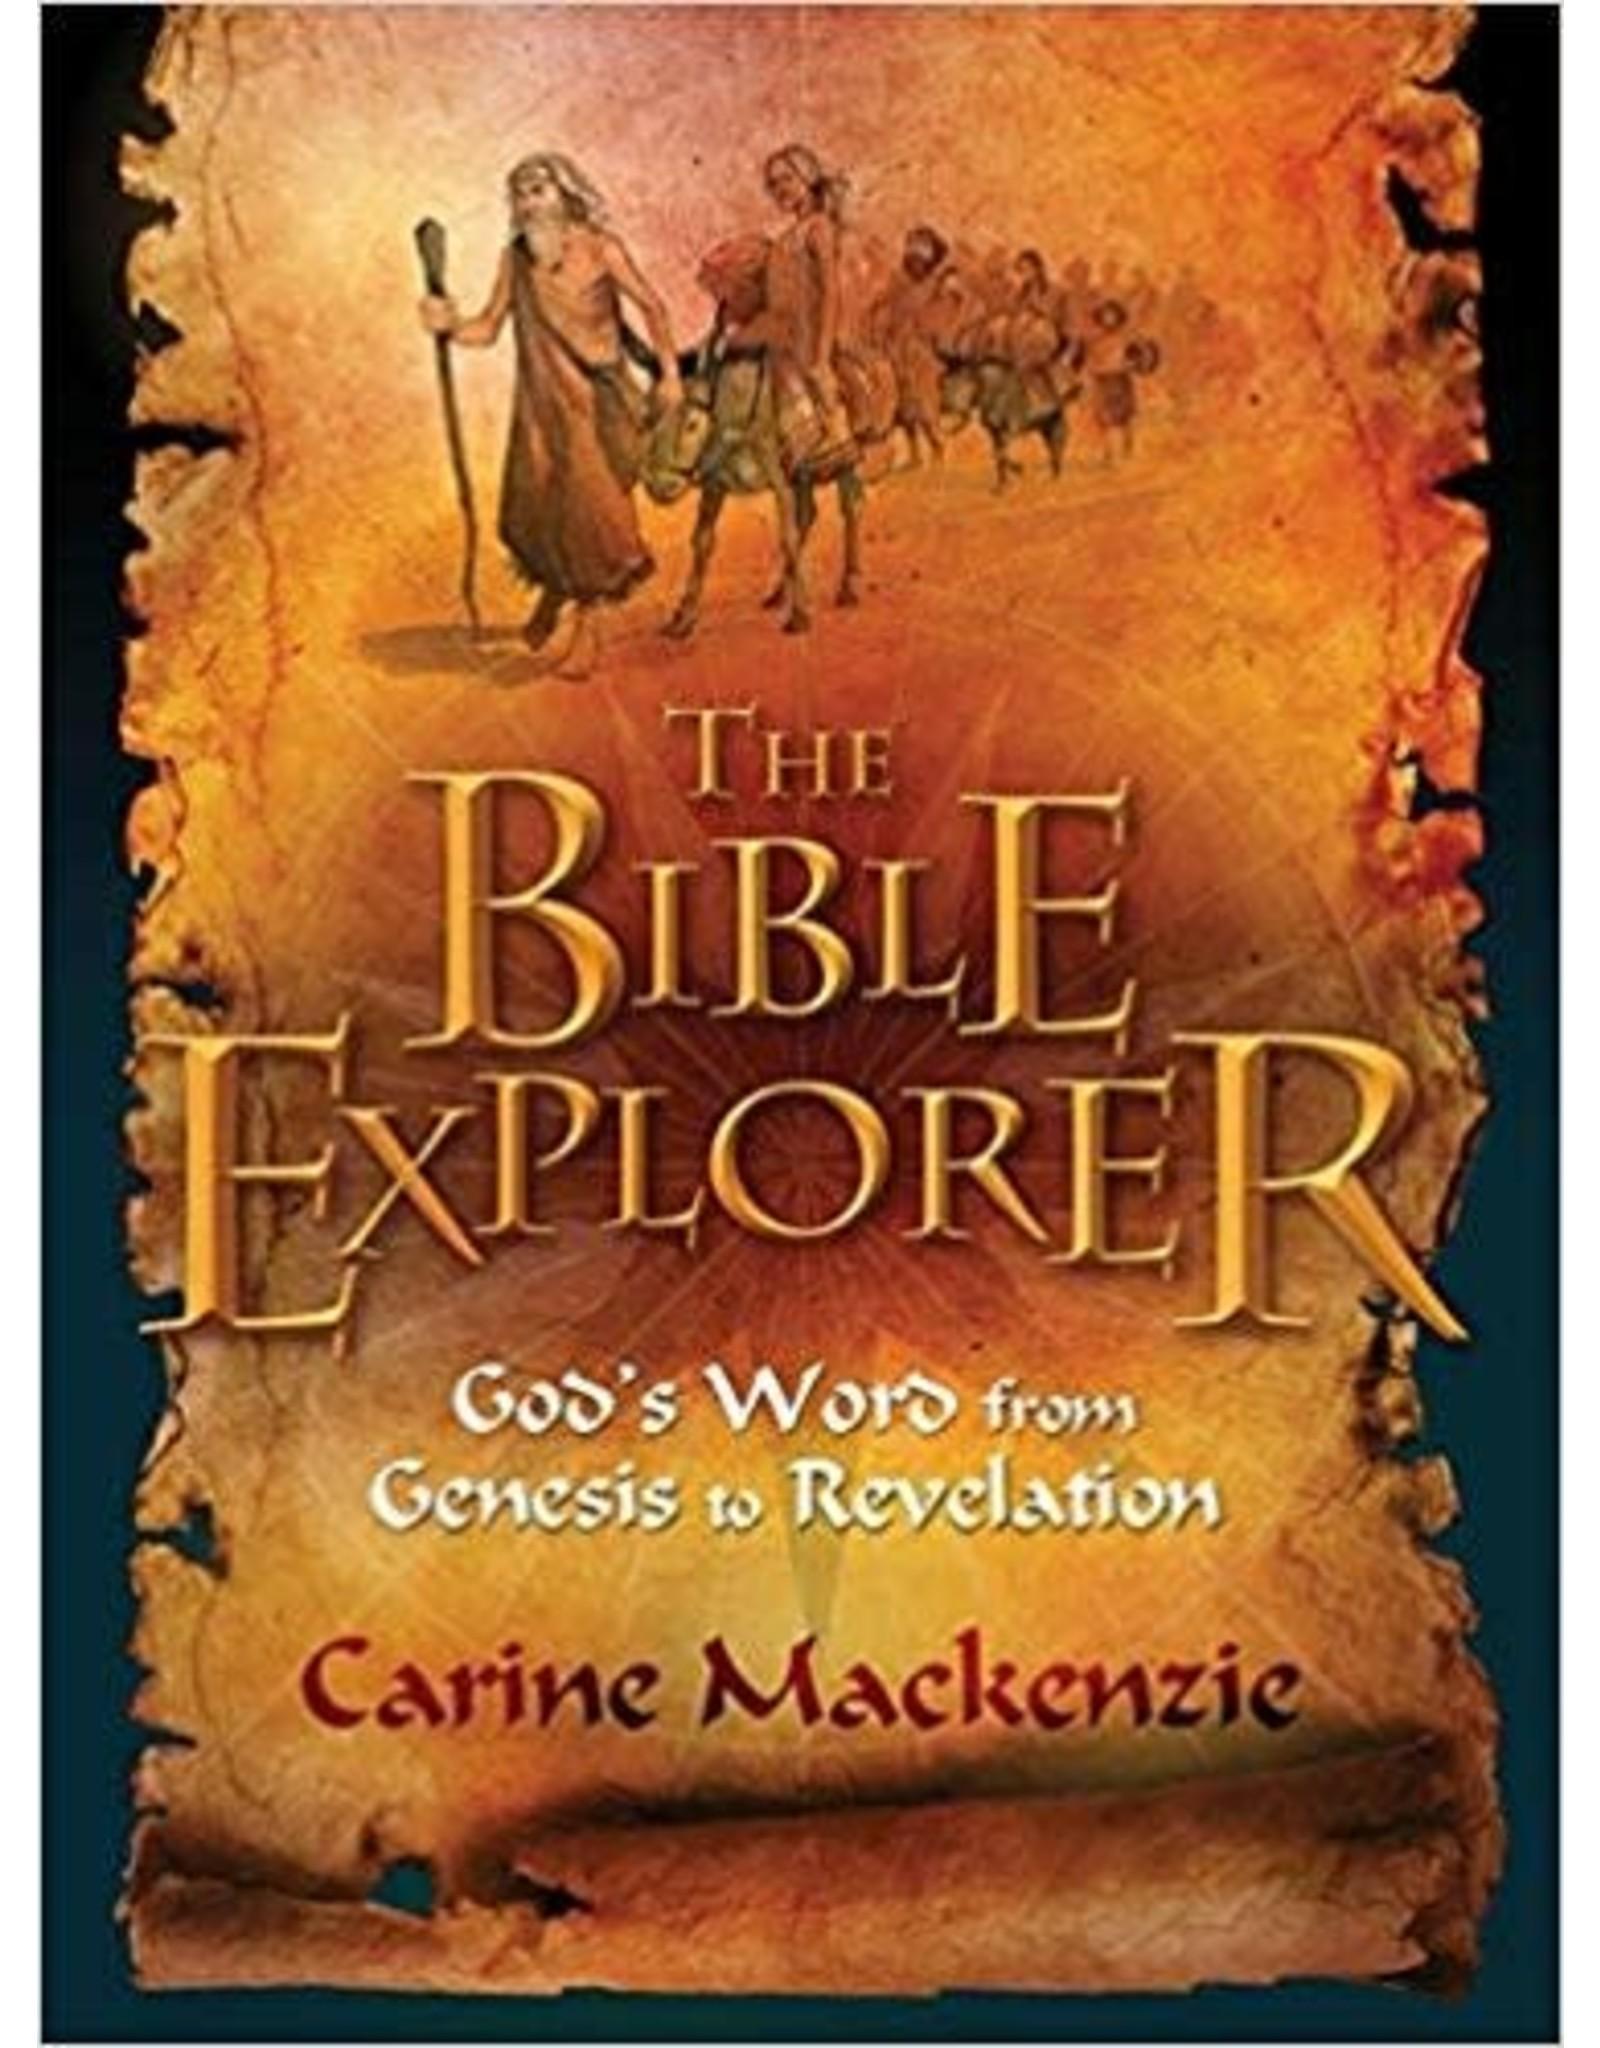 The Bible Explorer